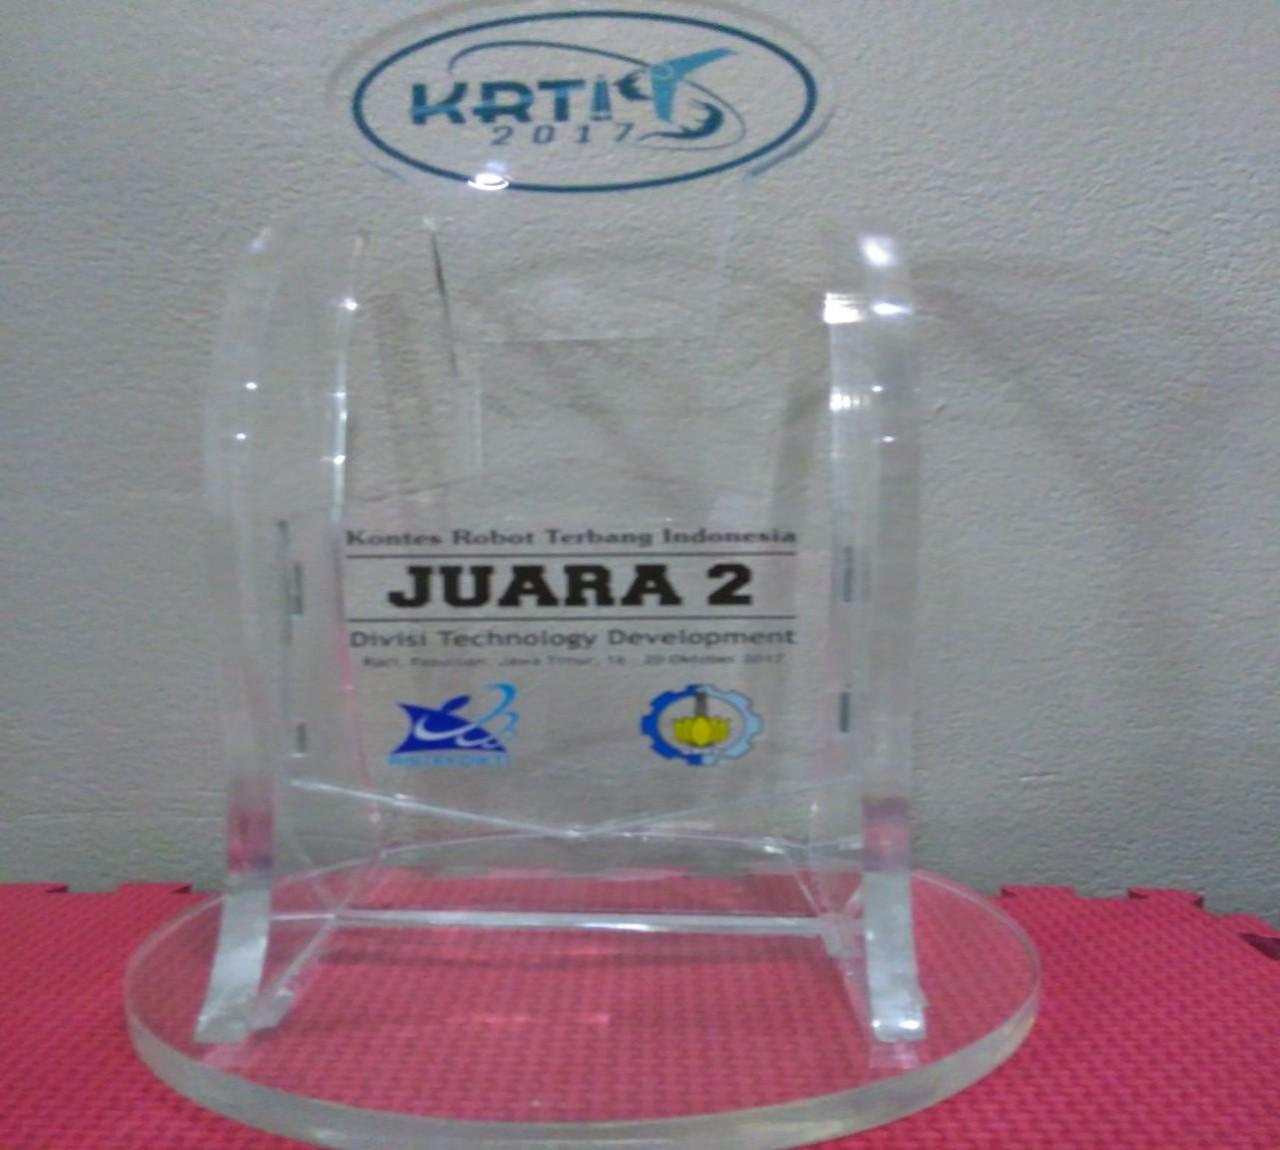 Piala Penghargaan Kontes Robot Terbang Indonesia